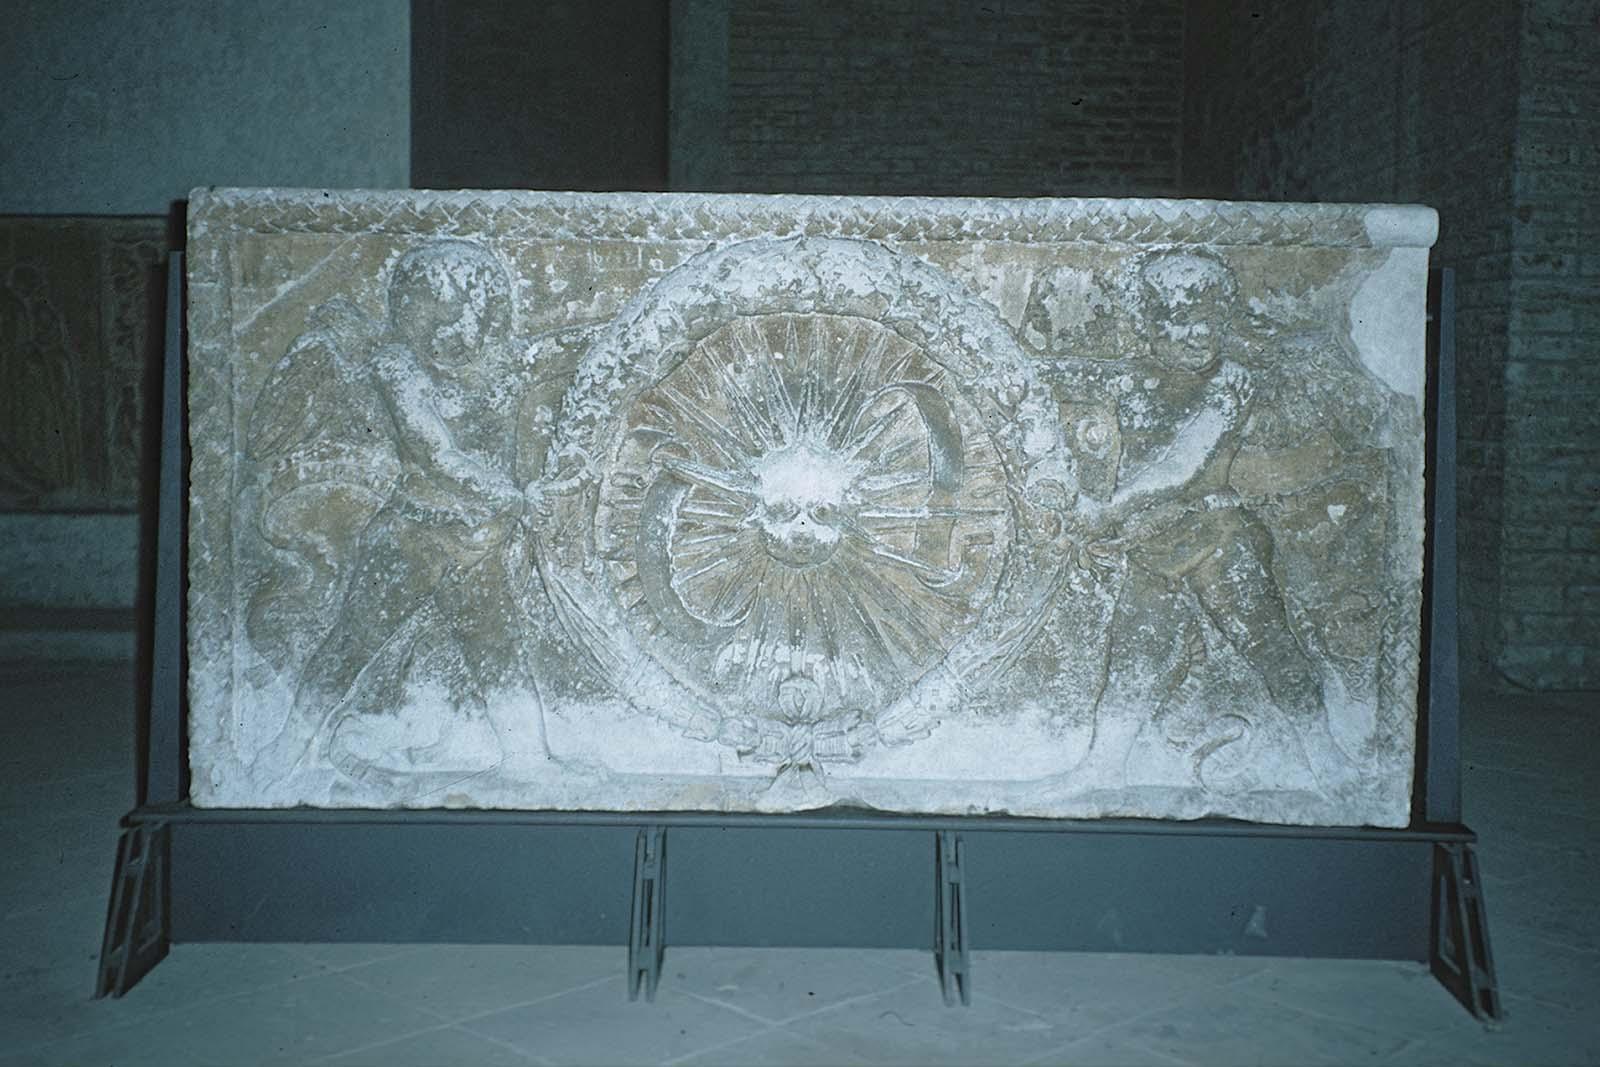 Arche-Restauri_Parma_1994_Plutei-Calchi-02